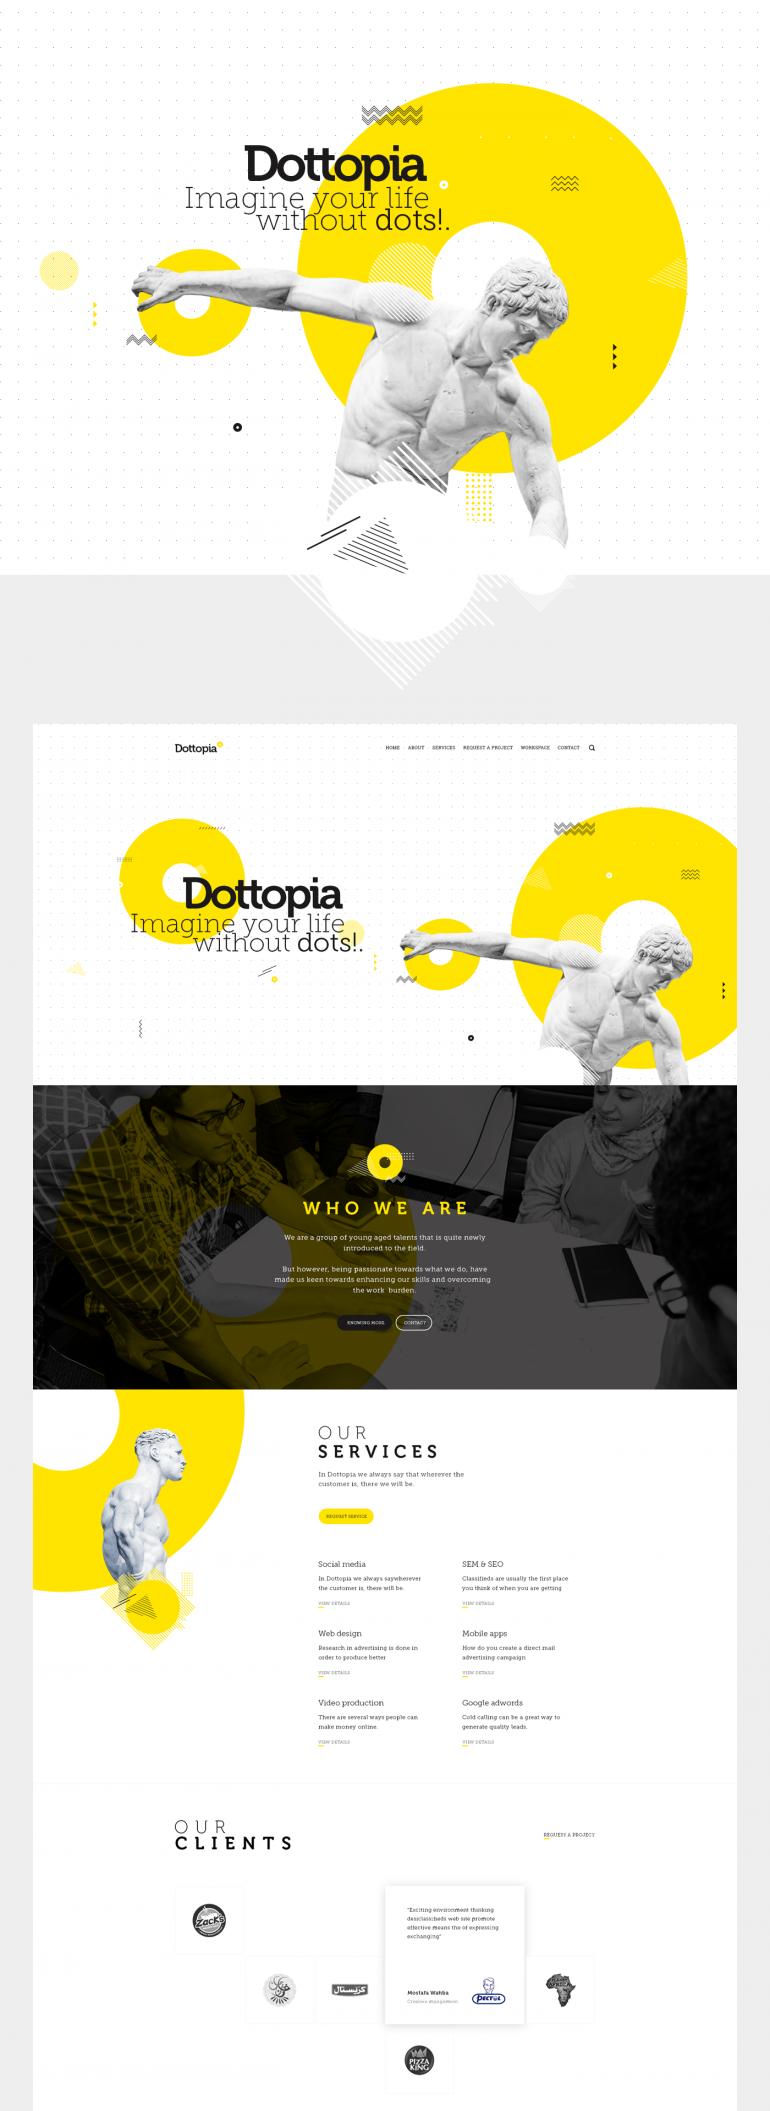 Dottopia web design UX/UI on Inspirationde